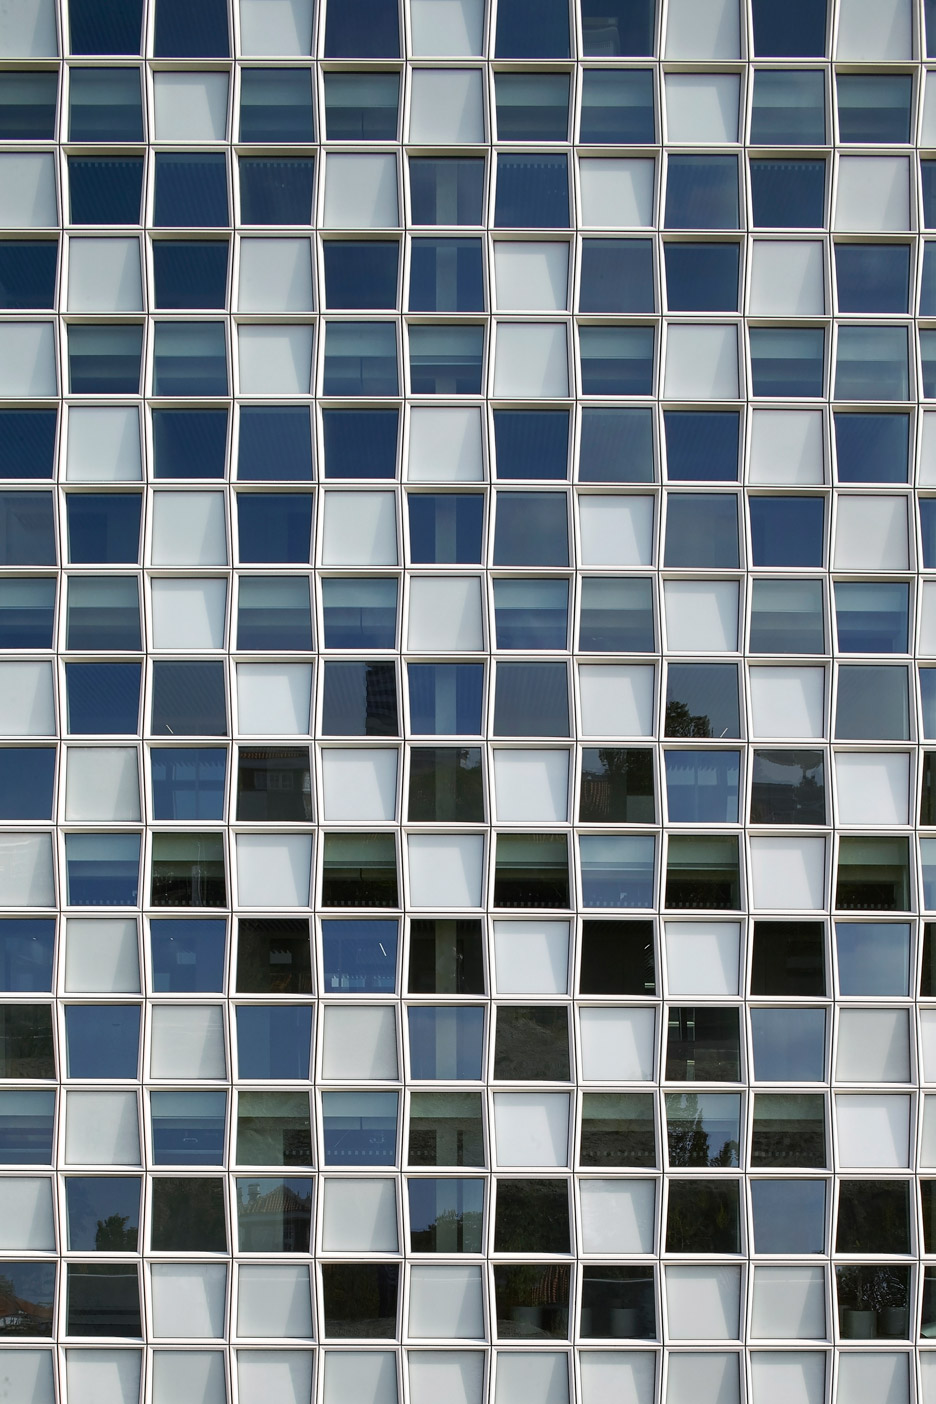 International Criminal Court in the Hague by Schmidt Hammer Lassen Architects